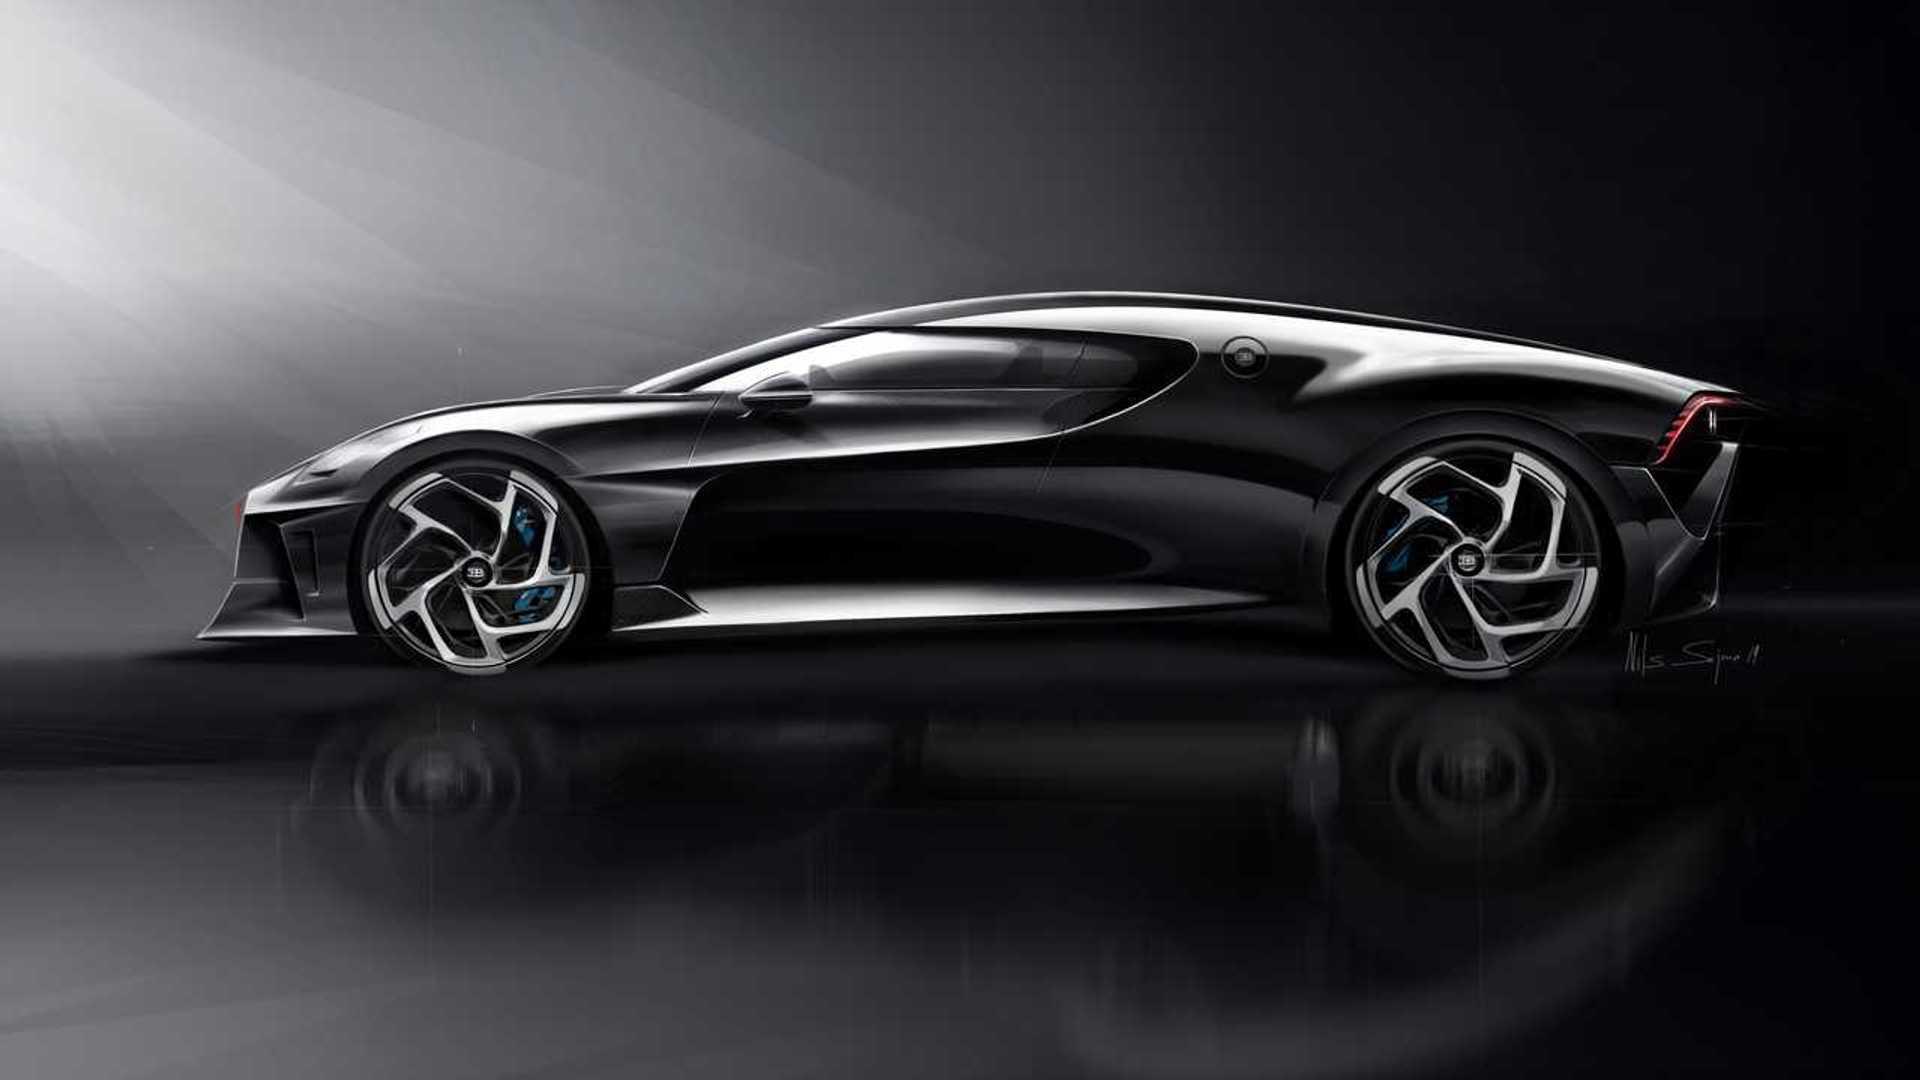 Bugatti La Voiture Noire: Bugatti La Voiture Noire